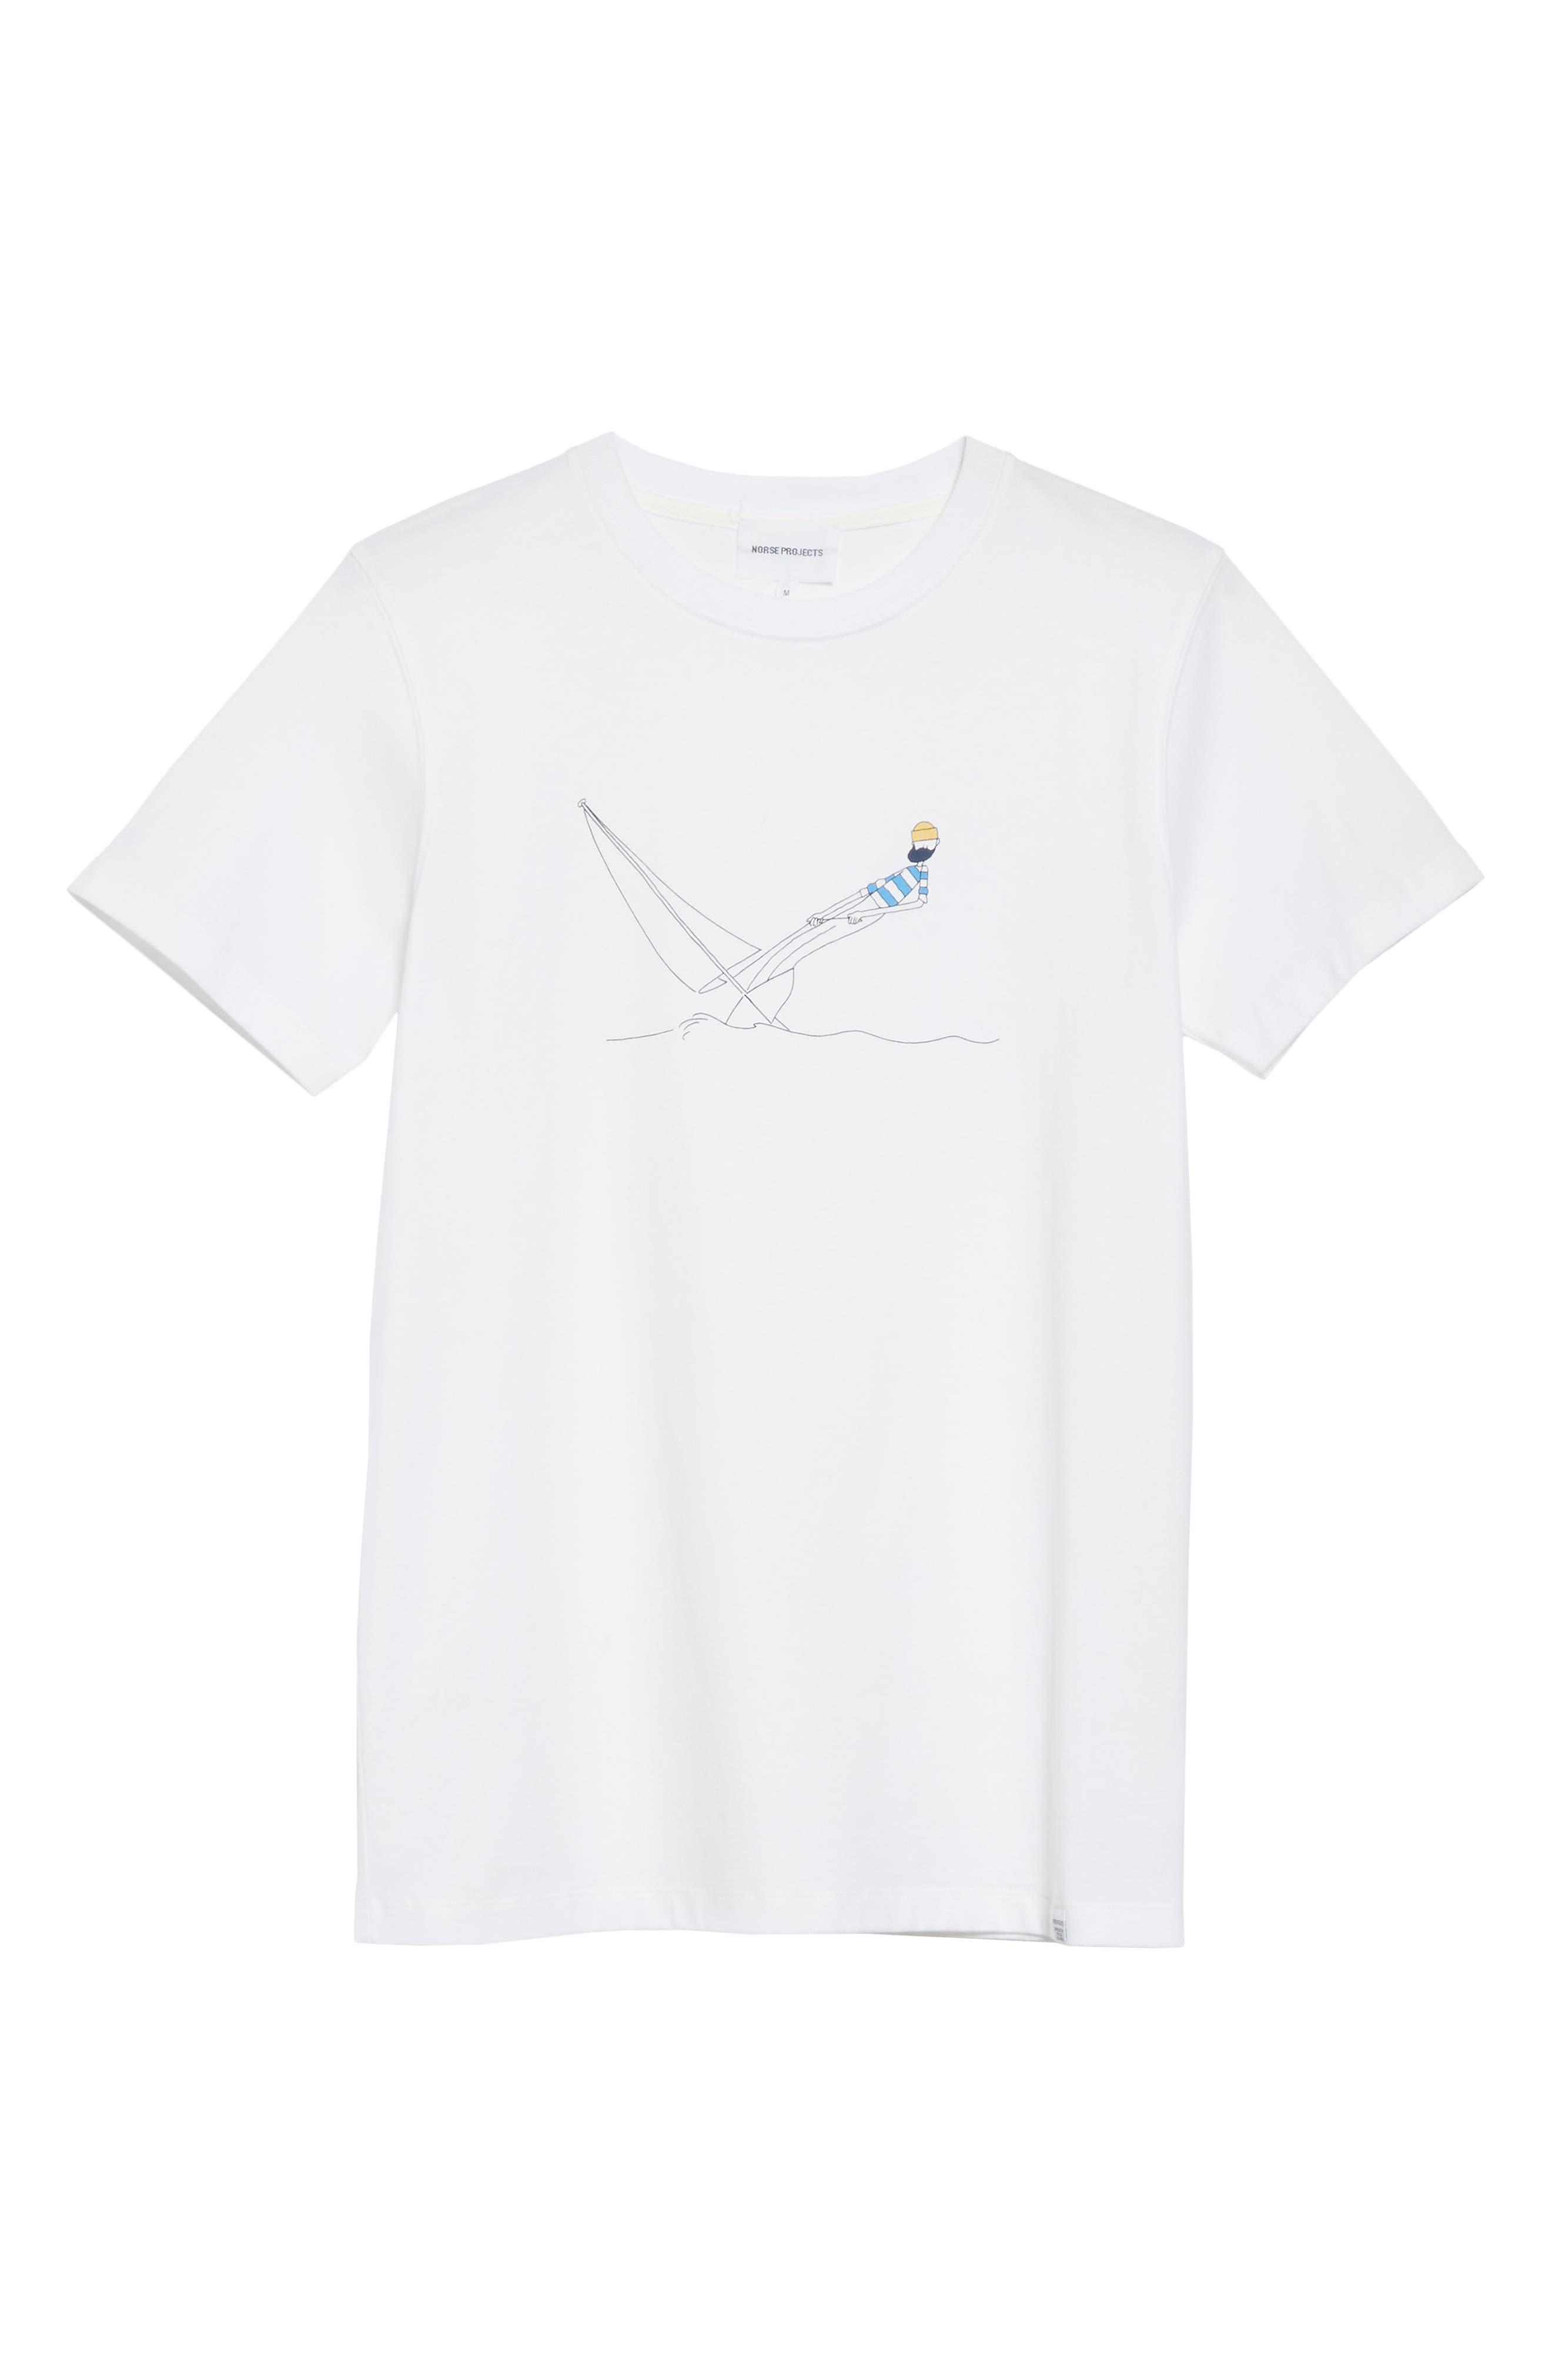 Daniel Frost - Hanging Graphic T-Shirt,                             Alternate thumbnail 6, color,                             WHITE